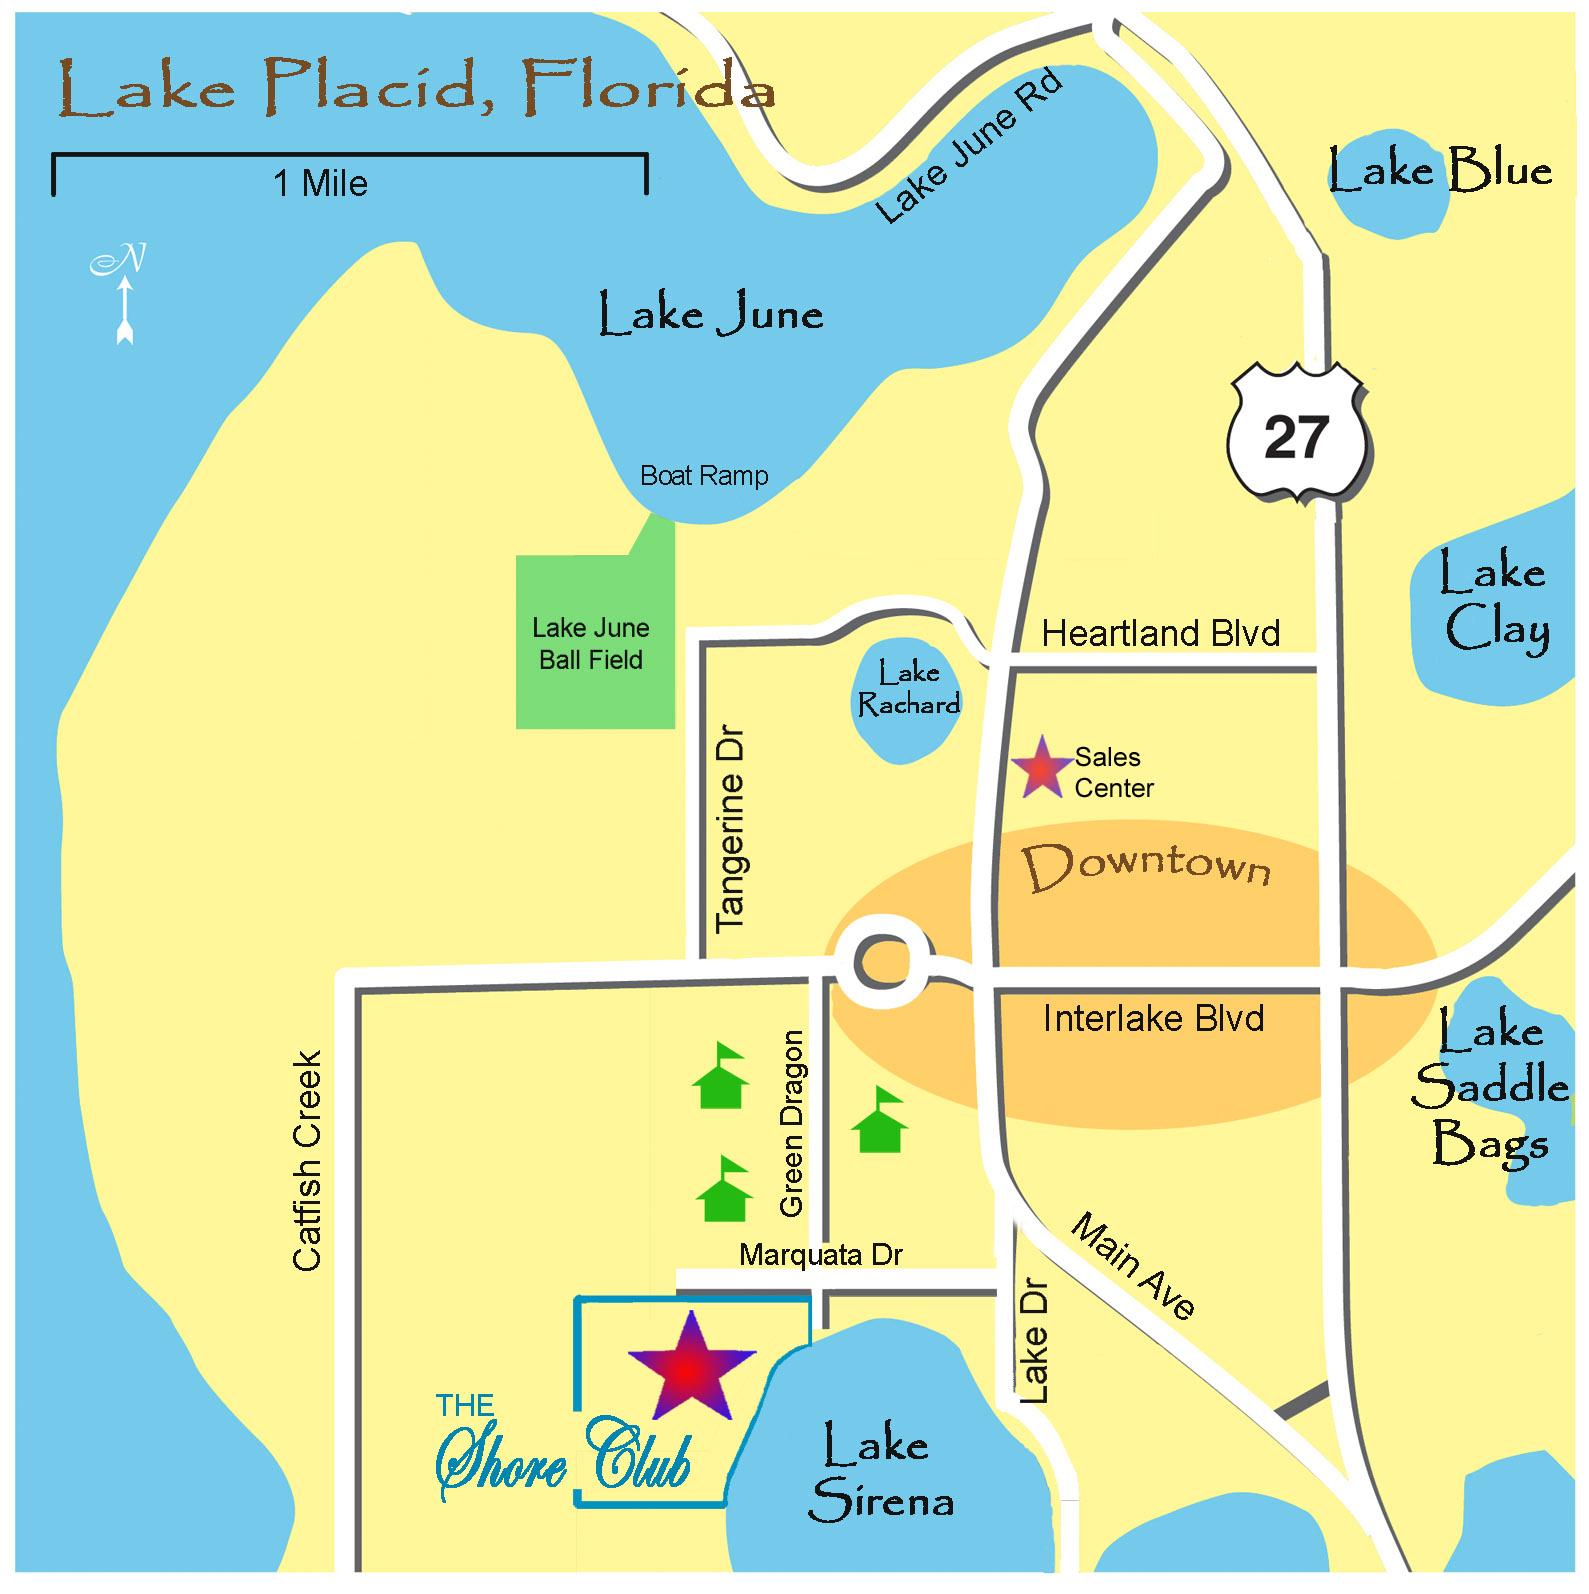 Lake Placide Town Map - Lake Placid Fl • Mappery - Lake Placid Florida Map